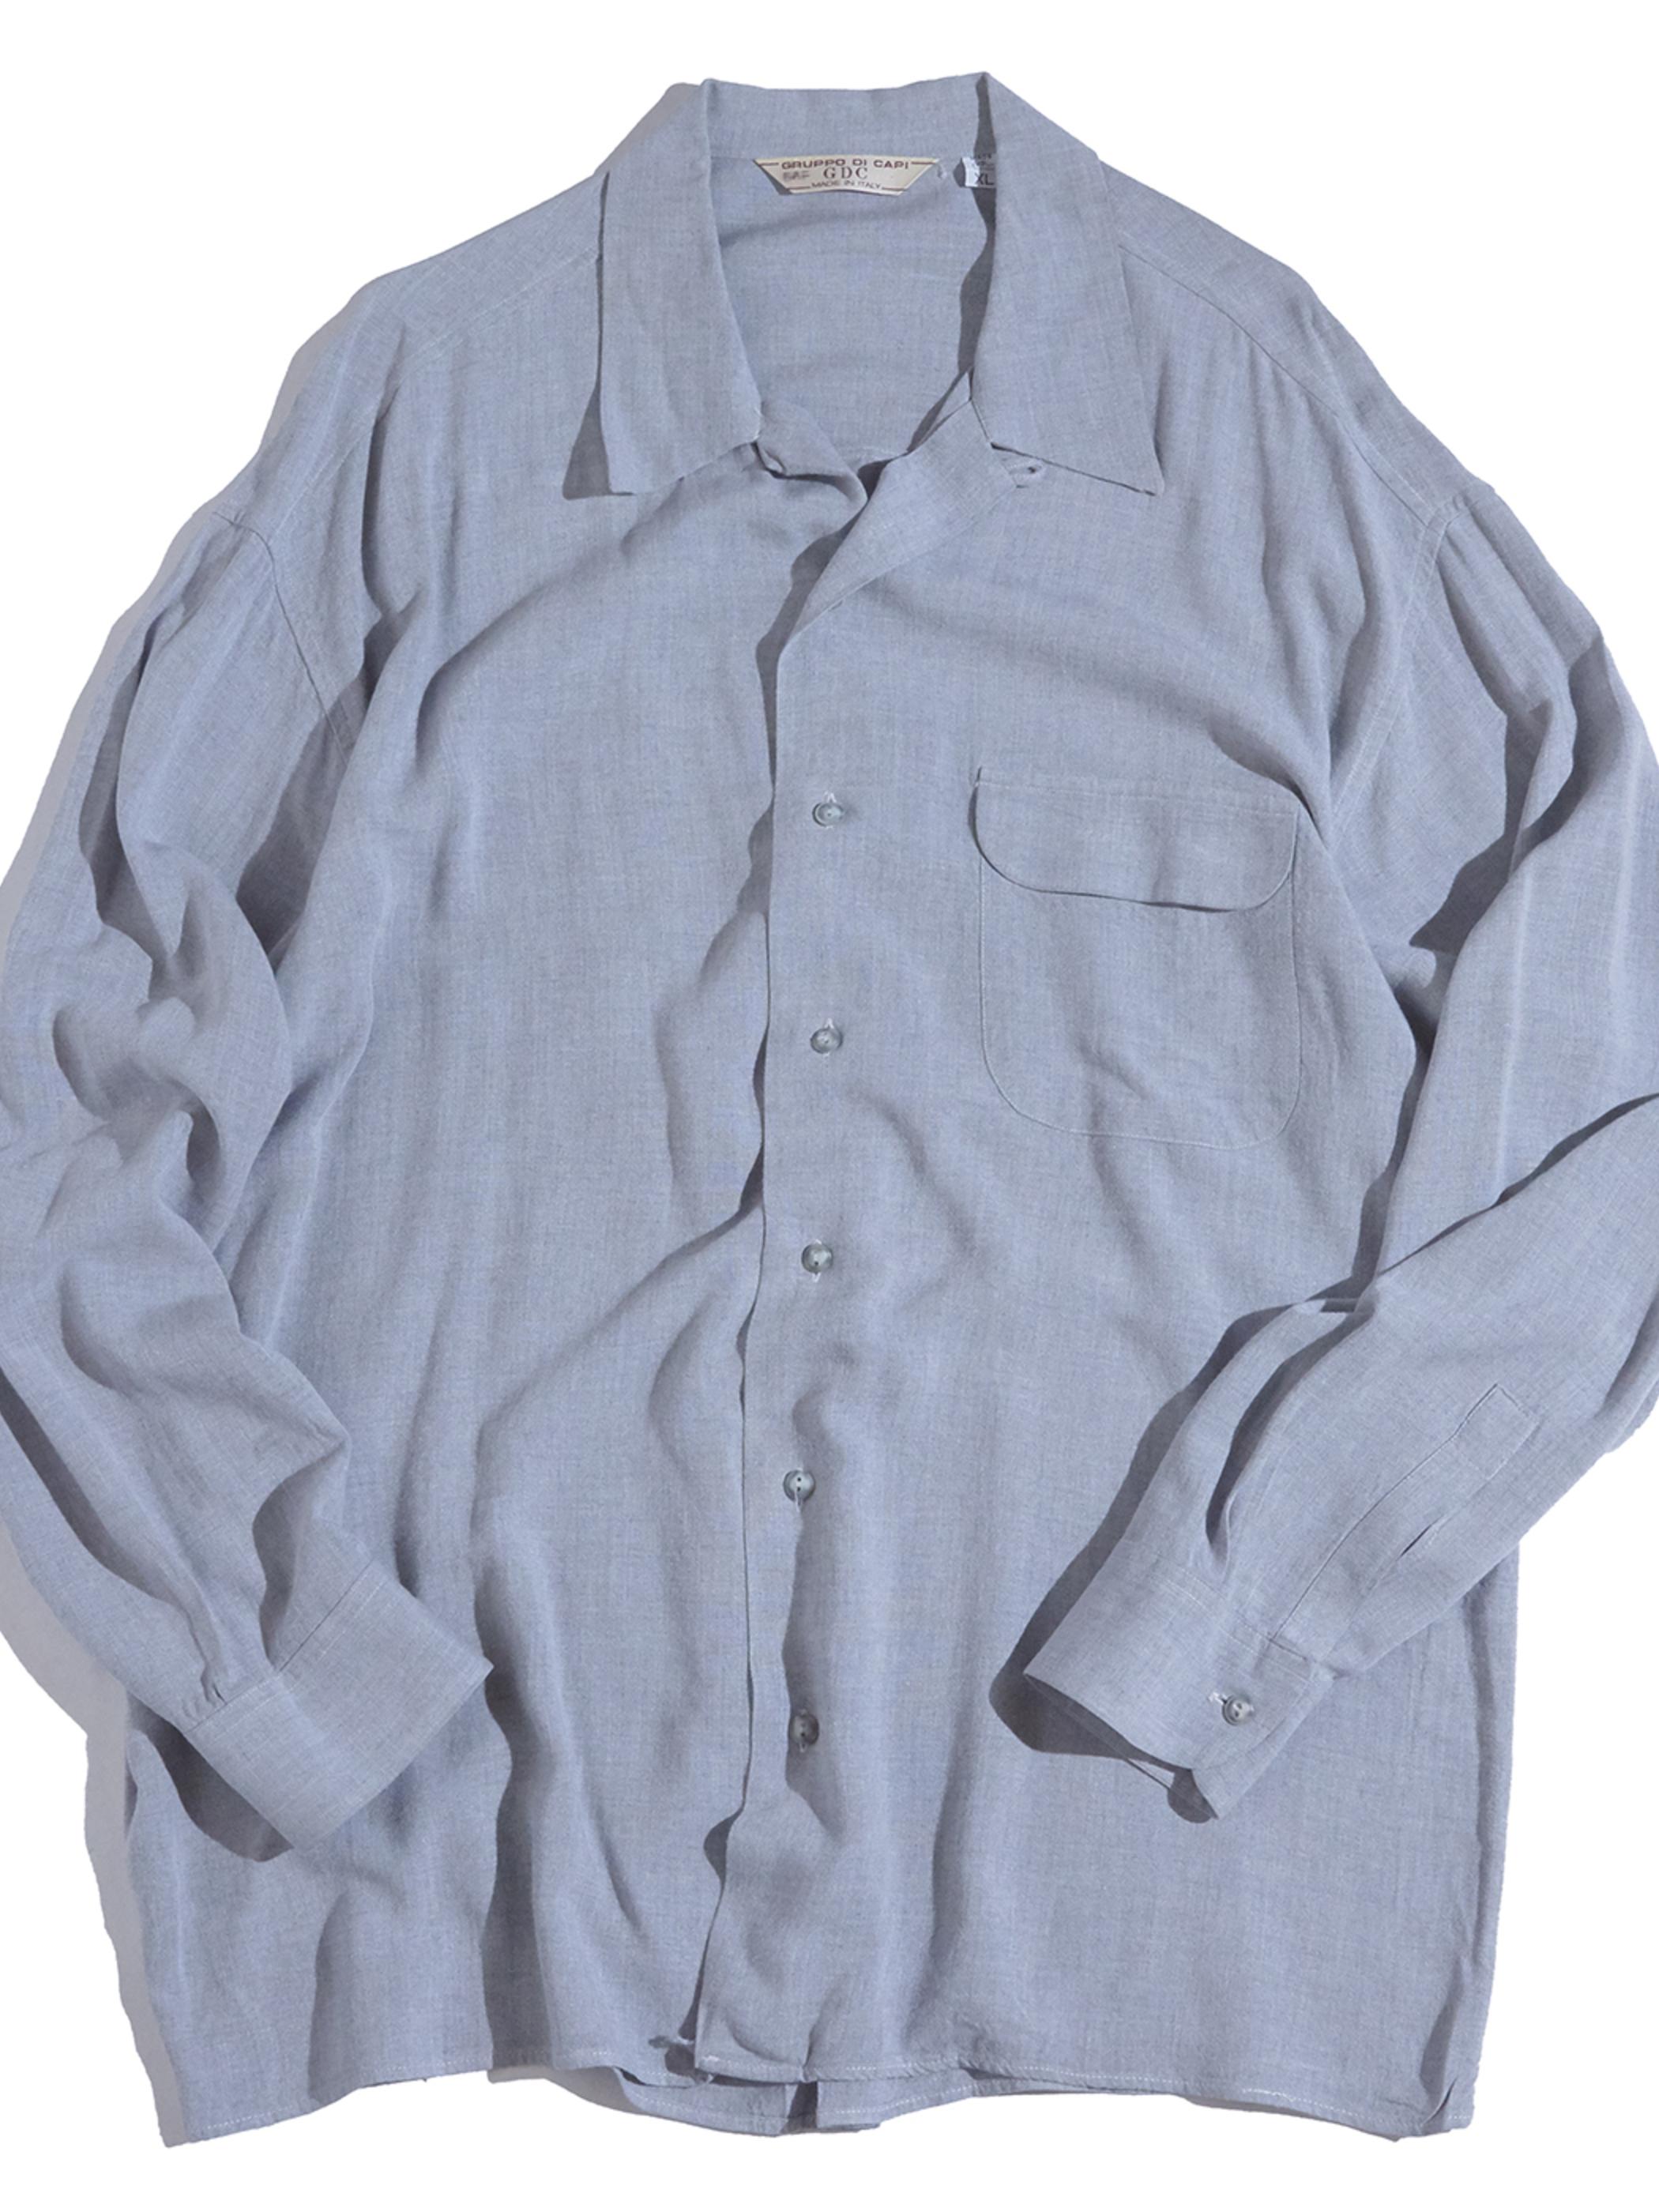 "1970s ""GRUPPO DI CAPI"" rayon shirt -LIGHT GRAY-"